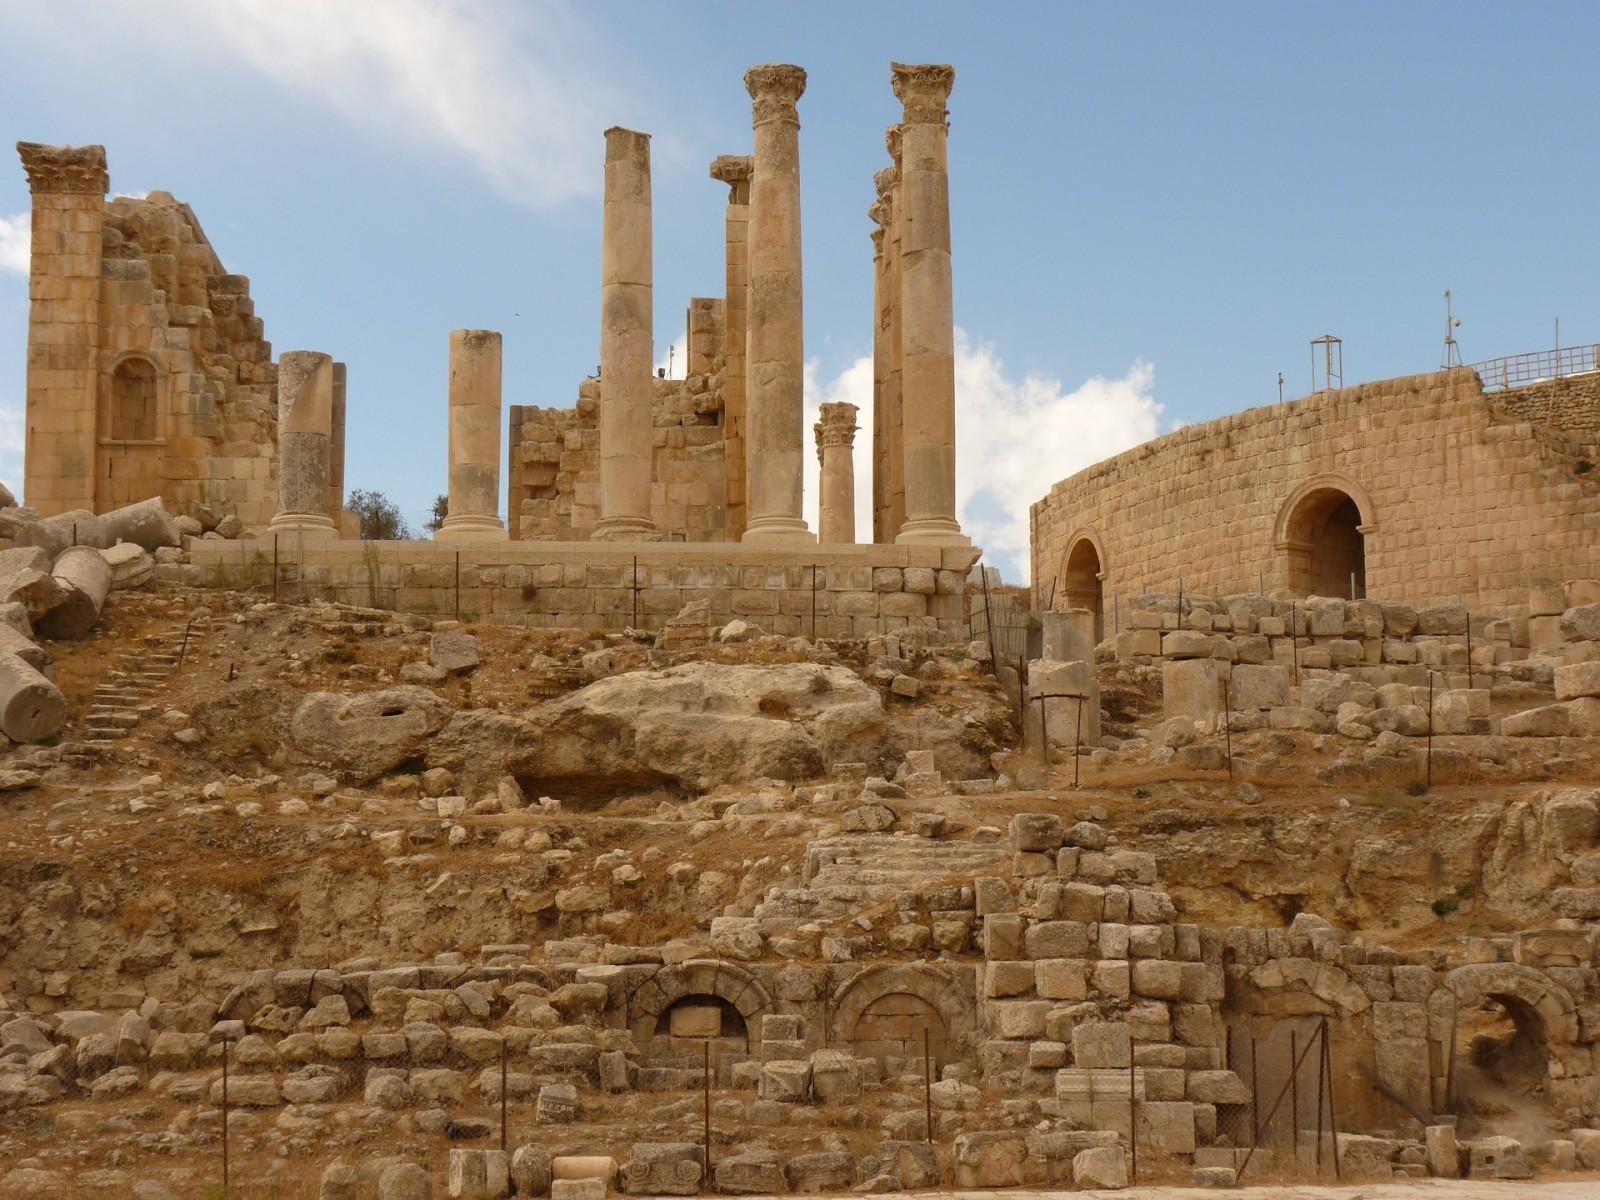 Temple of Artemis, Israel, Pixabay.com